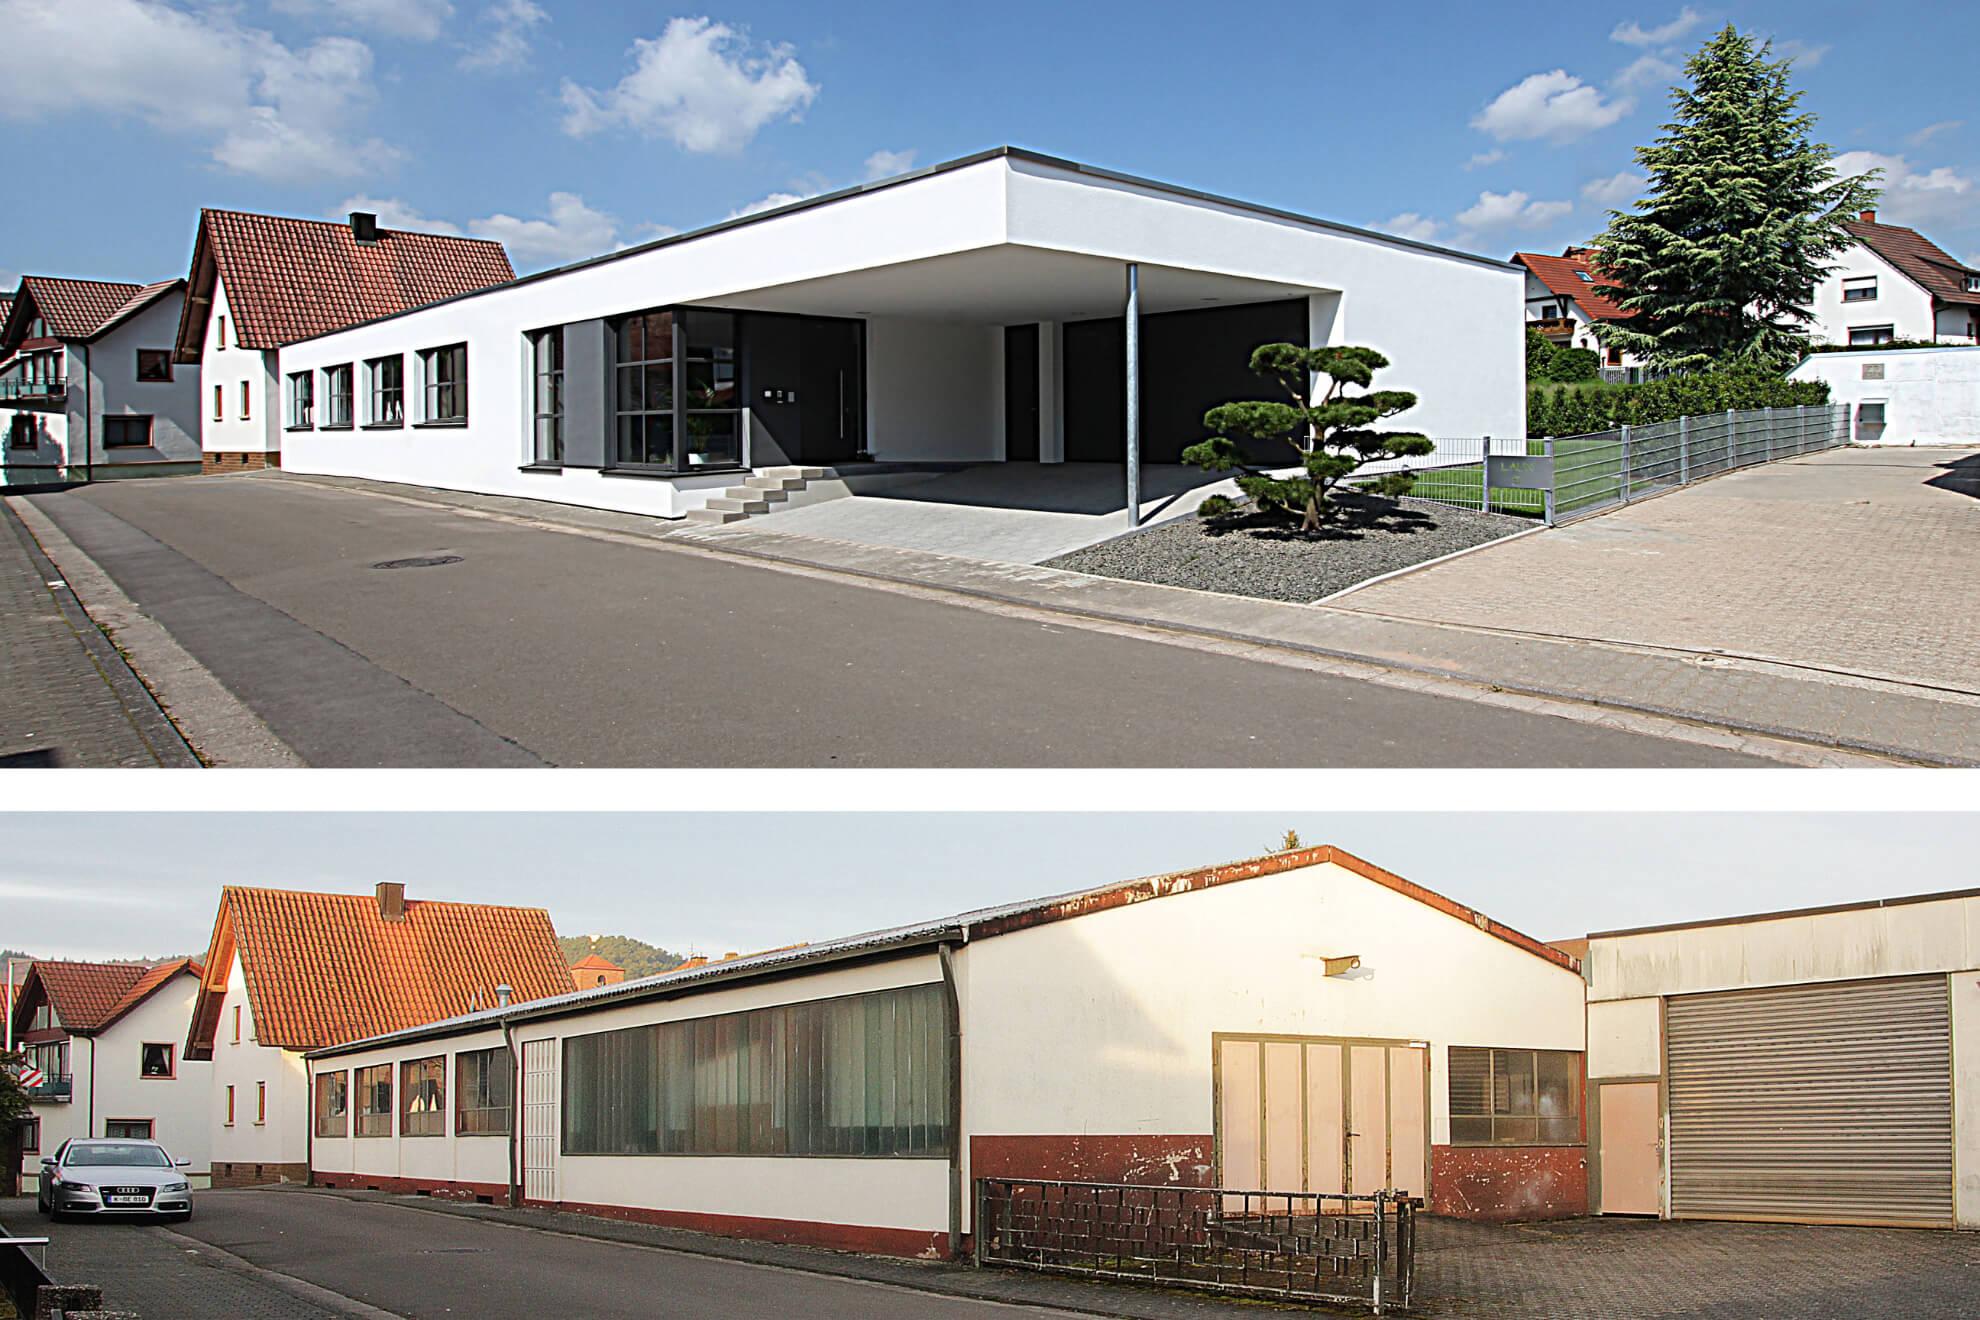 lx-b-00-marcbetz architekten